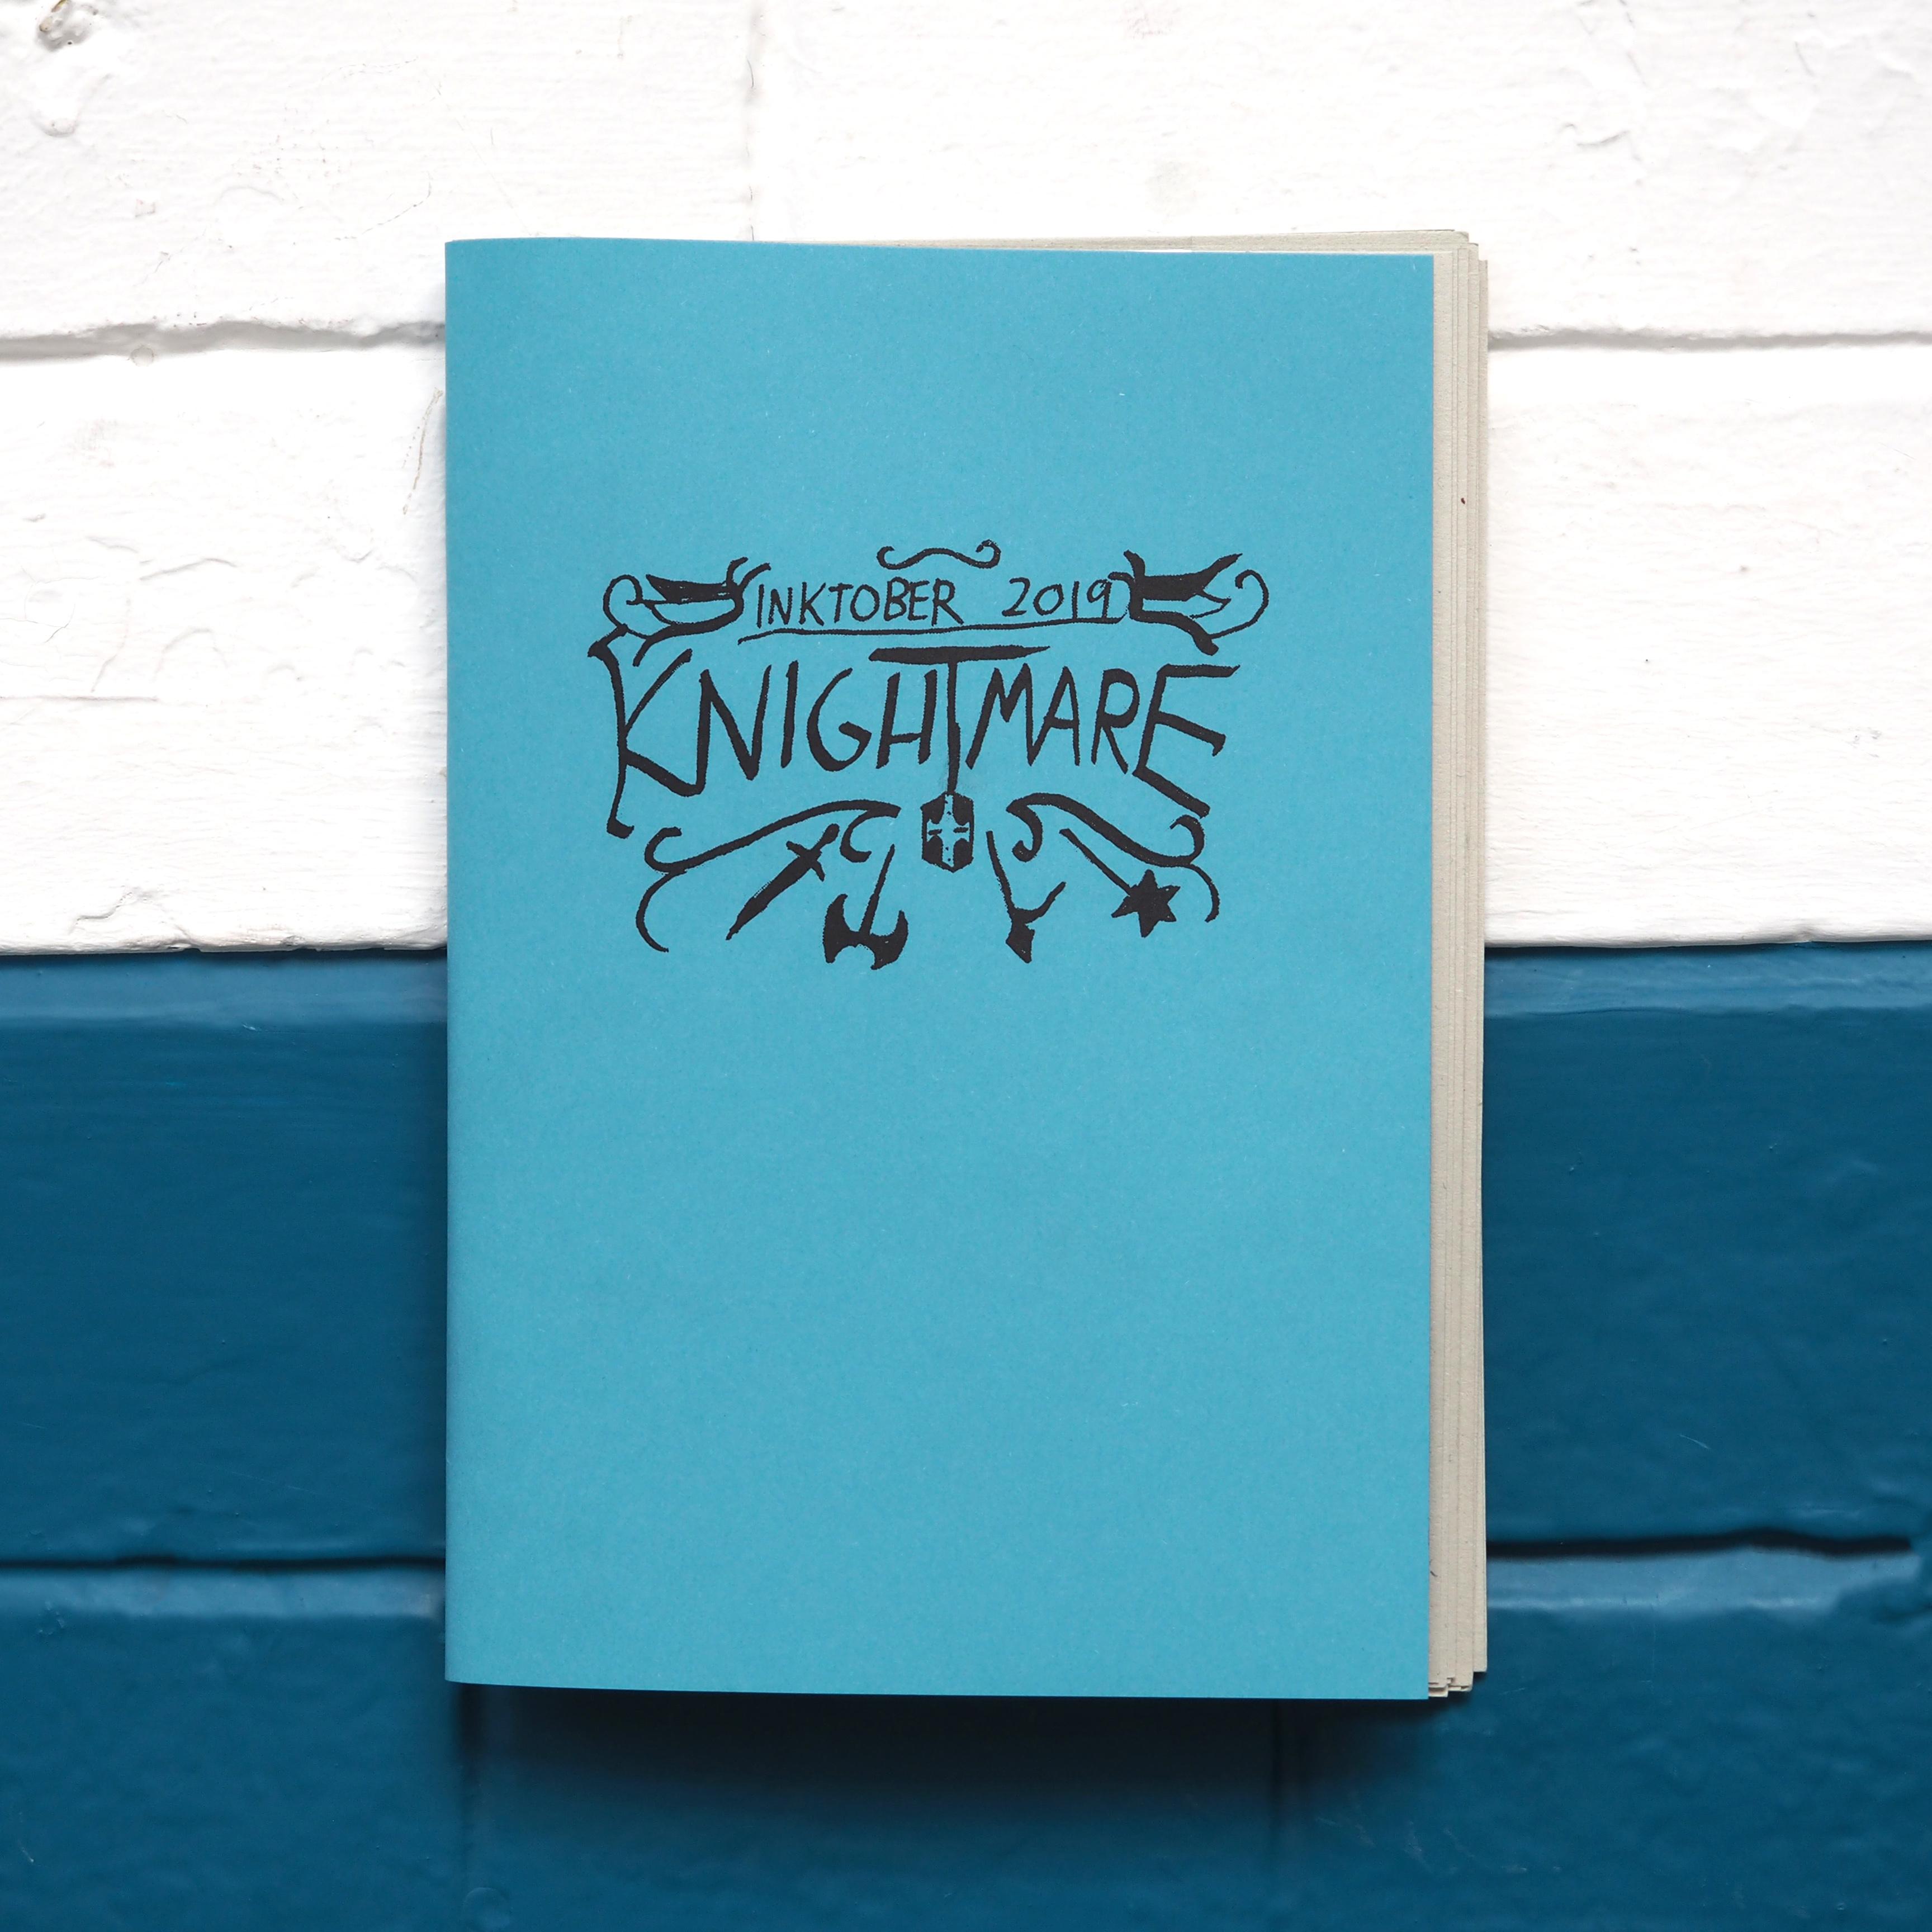 Knightmare- David Baillie